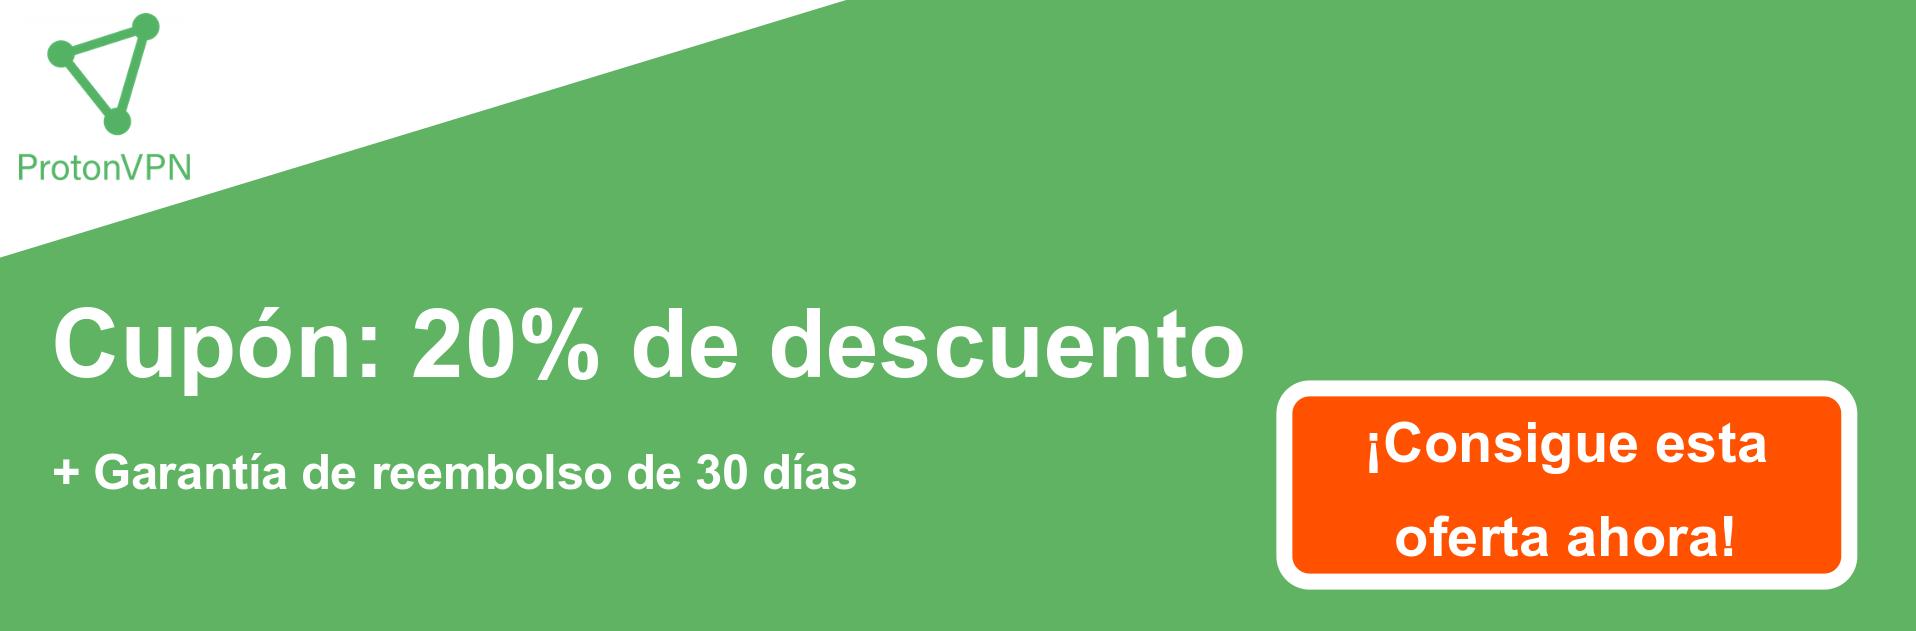 Banner de cupón ProtonVPN: 20% de descuento